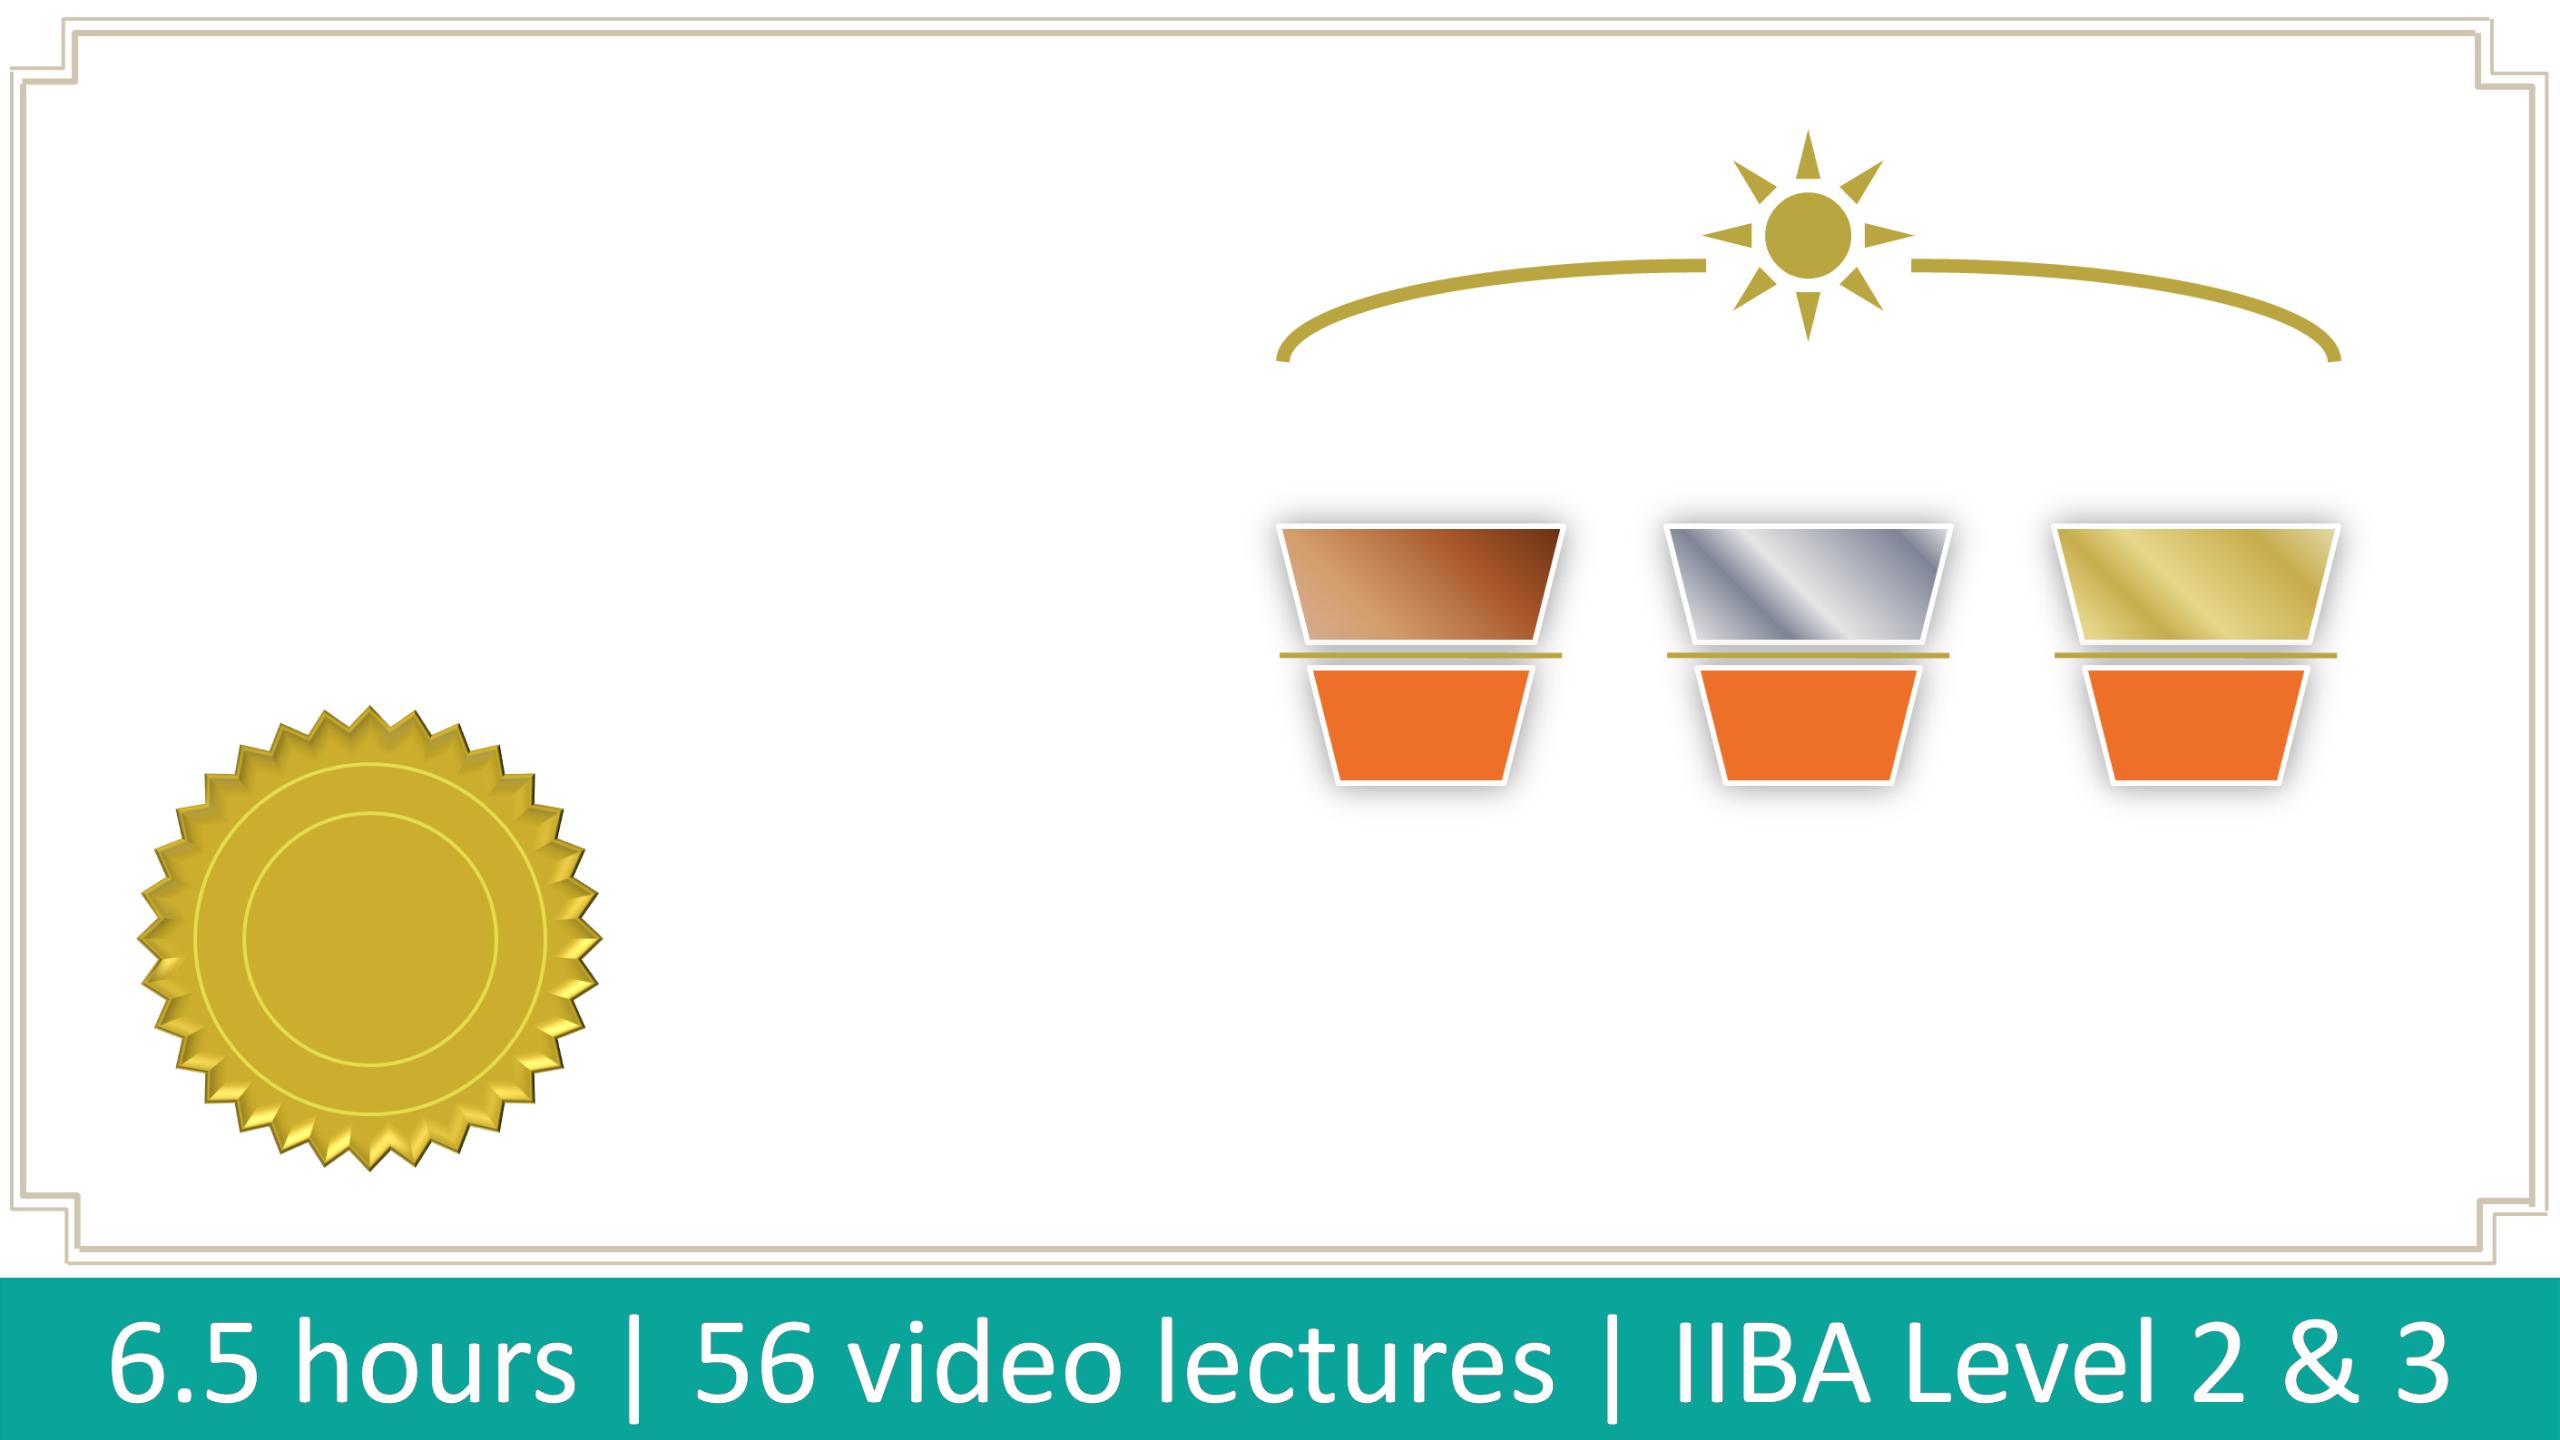 IIBA CBAP CCBA Business Analysis Certification Course